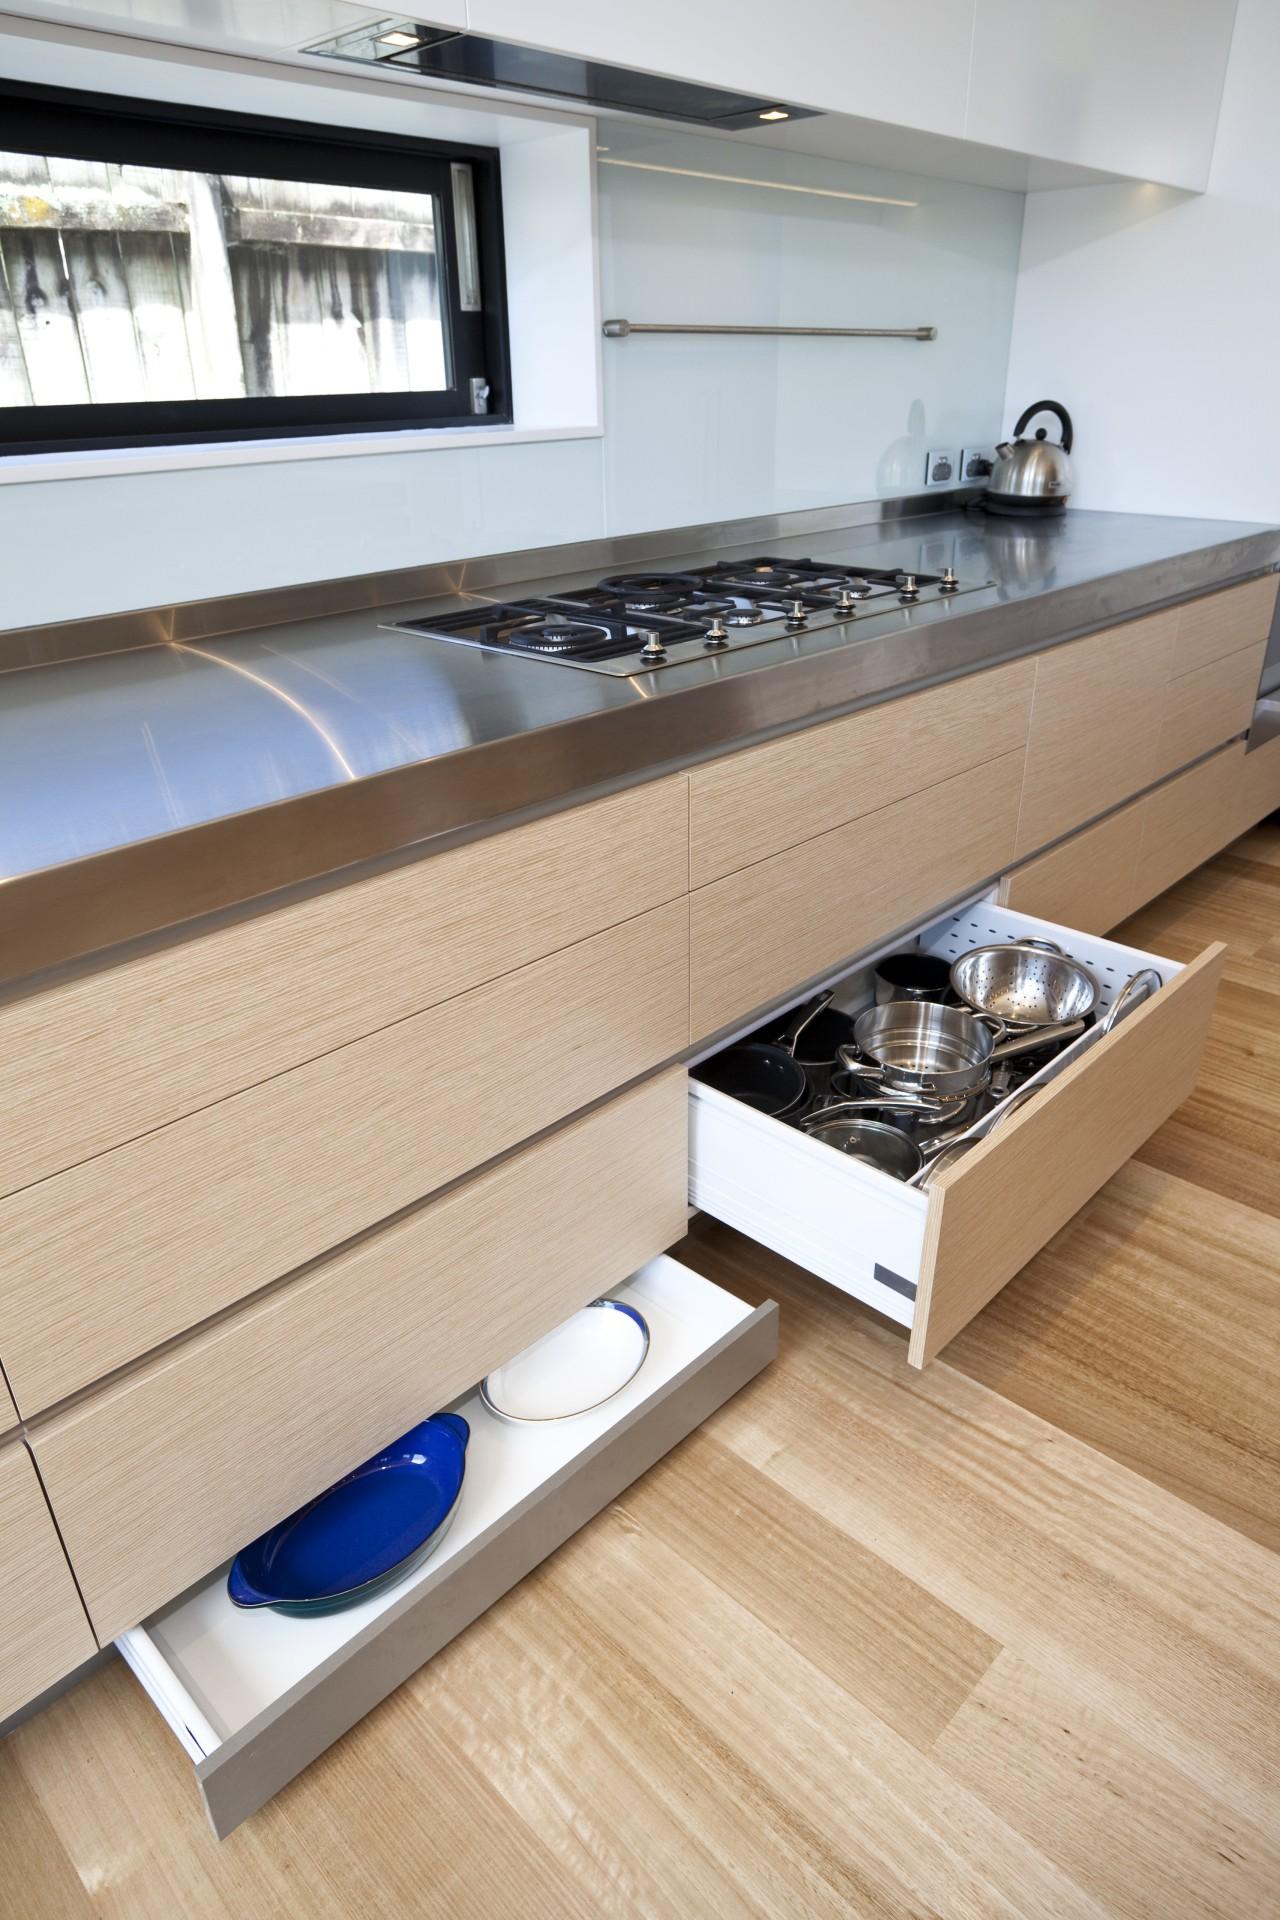 View of a kitchen built by RH Cabinetry floor, flooring, furniture, interior design, kitchen, product design, wood, orange, gray